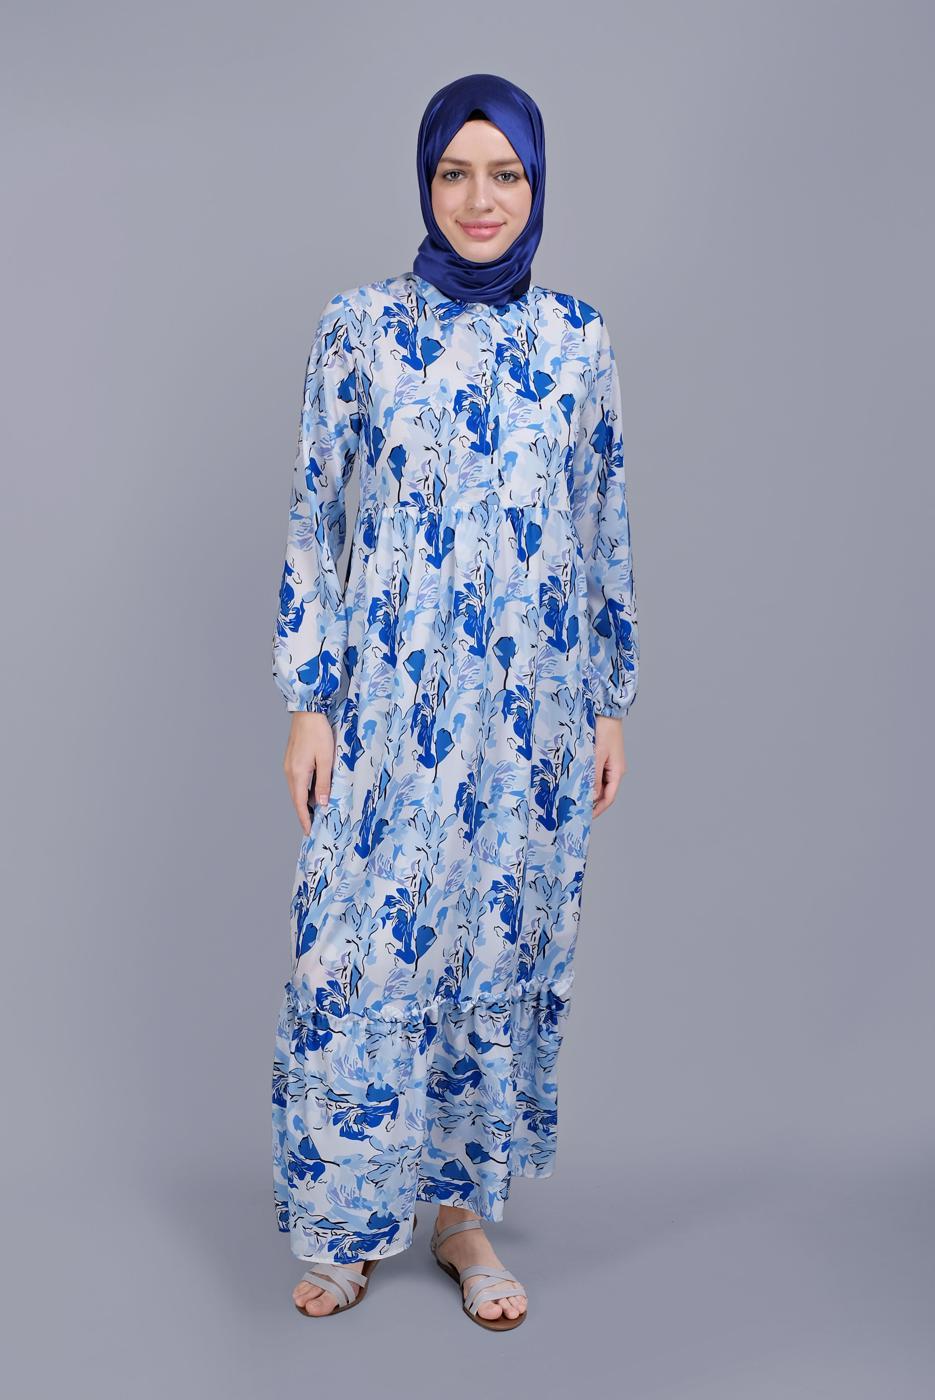 Bayan MAVİ DESENLİ VOLANLI ELBİSE  00001